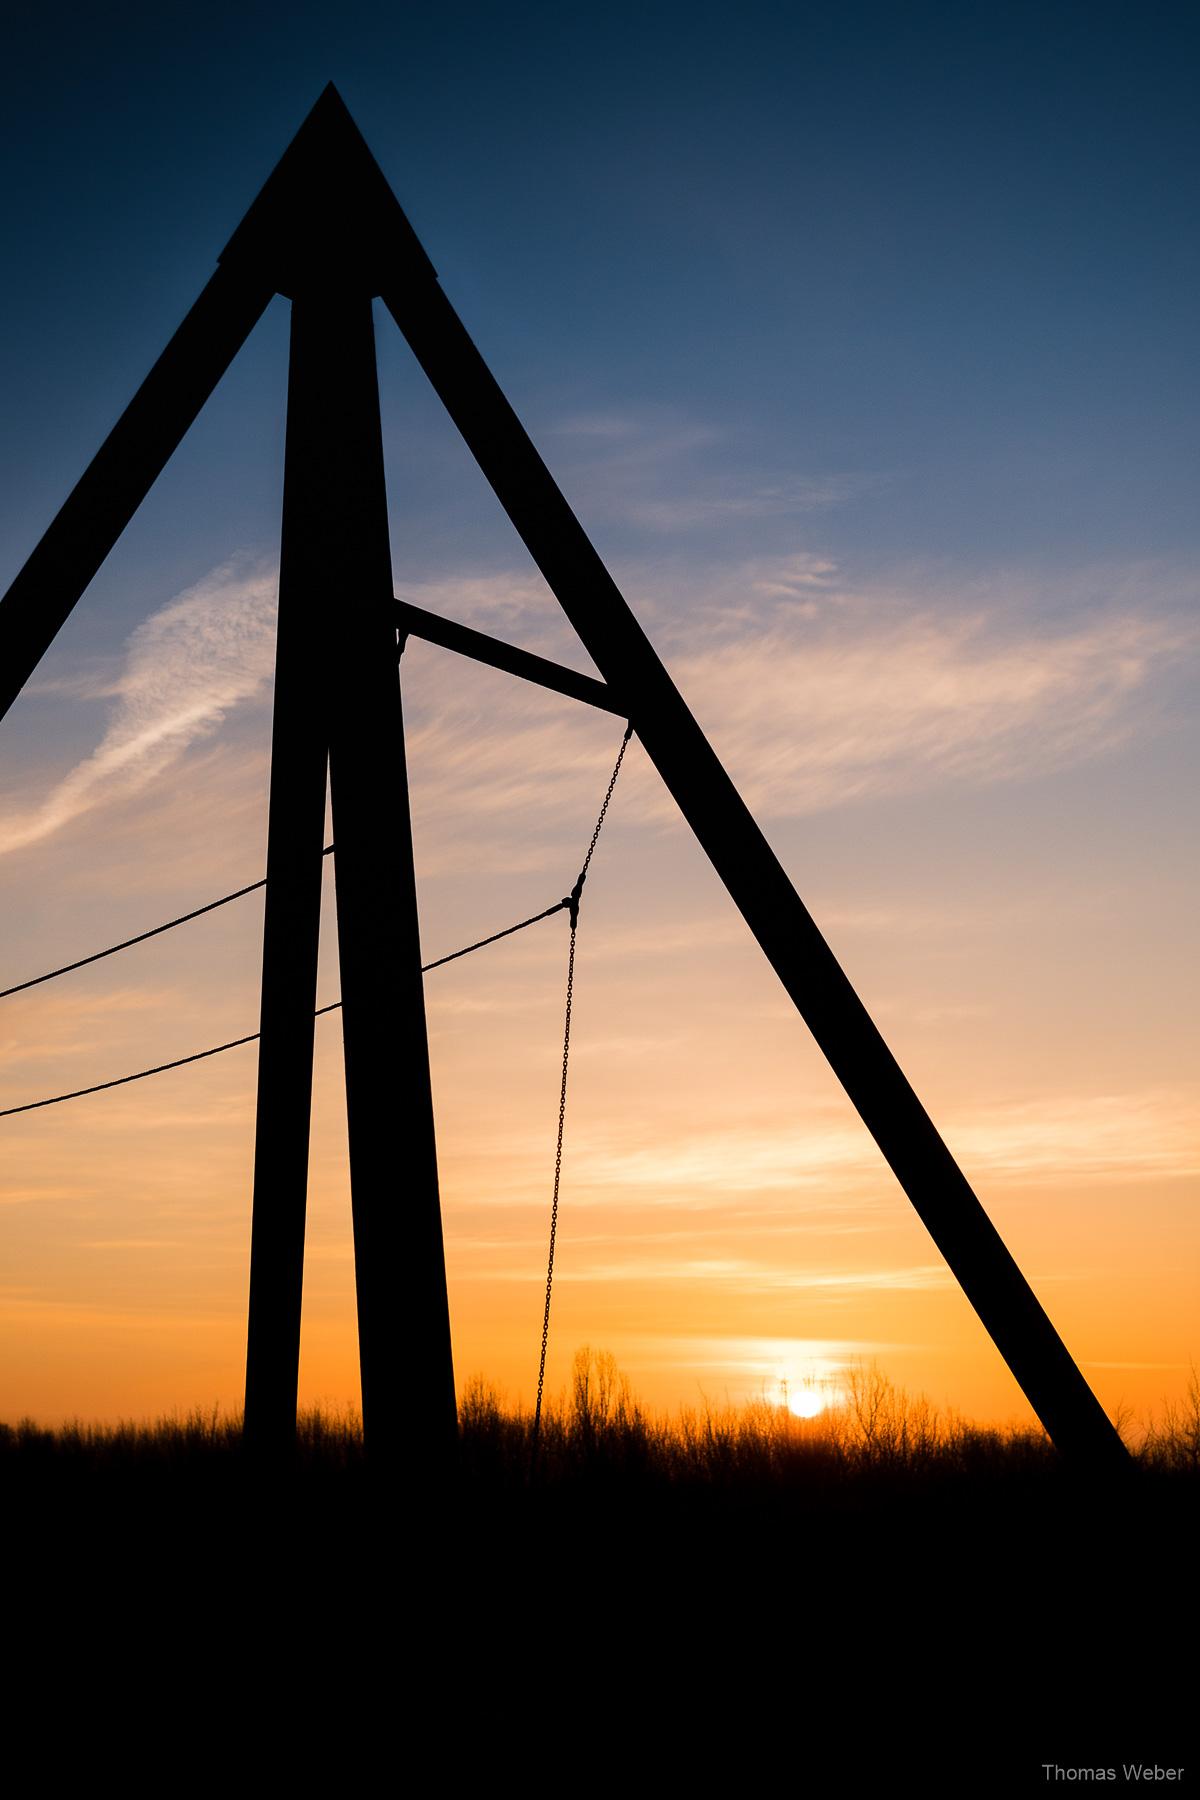 Sonnenaufgang auf dem Utkiek in Oldenburg, Fotograf Thomas Weber aus Oldenburg